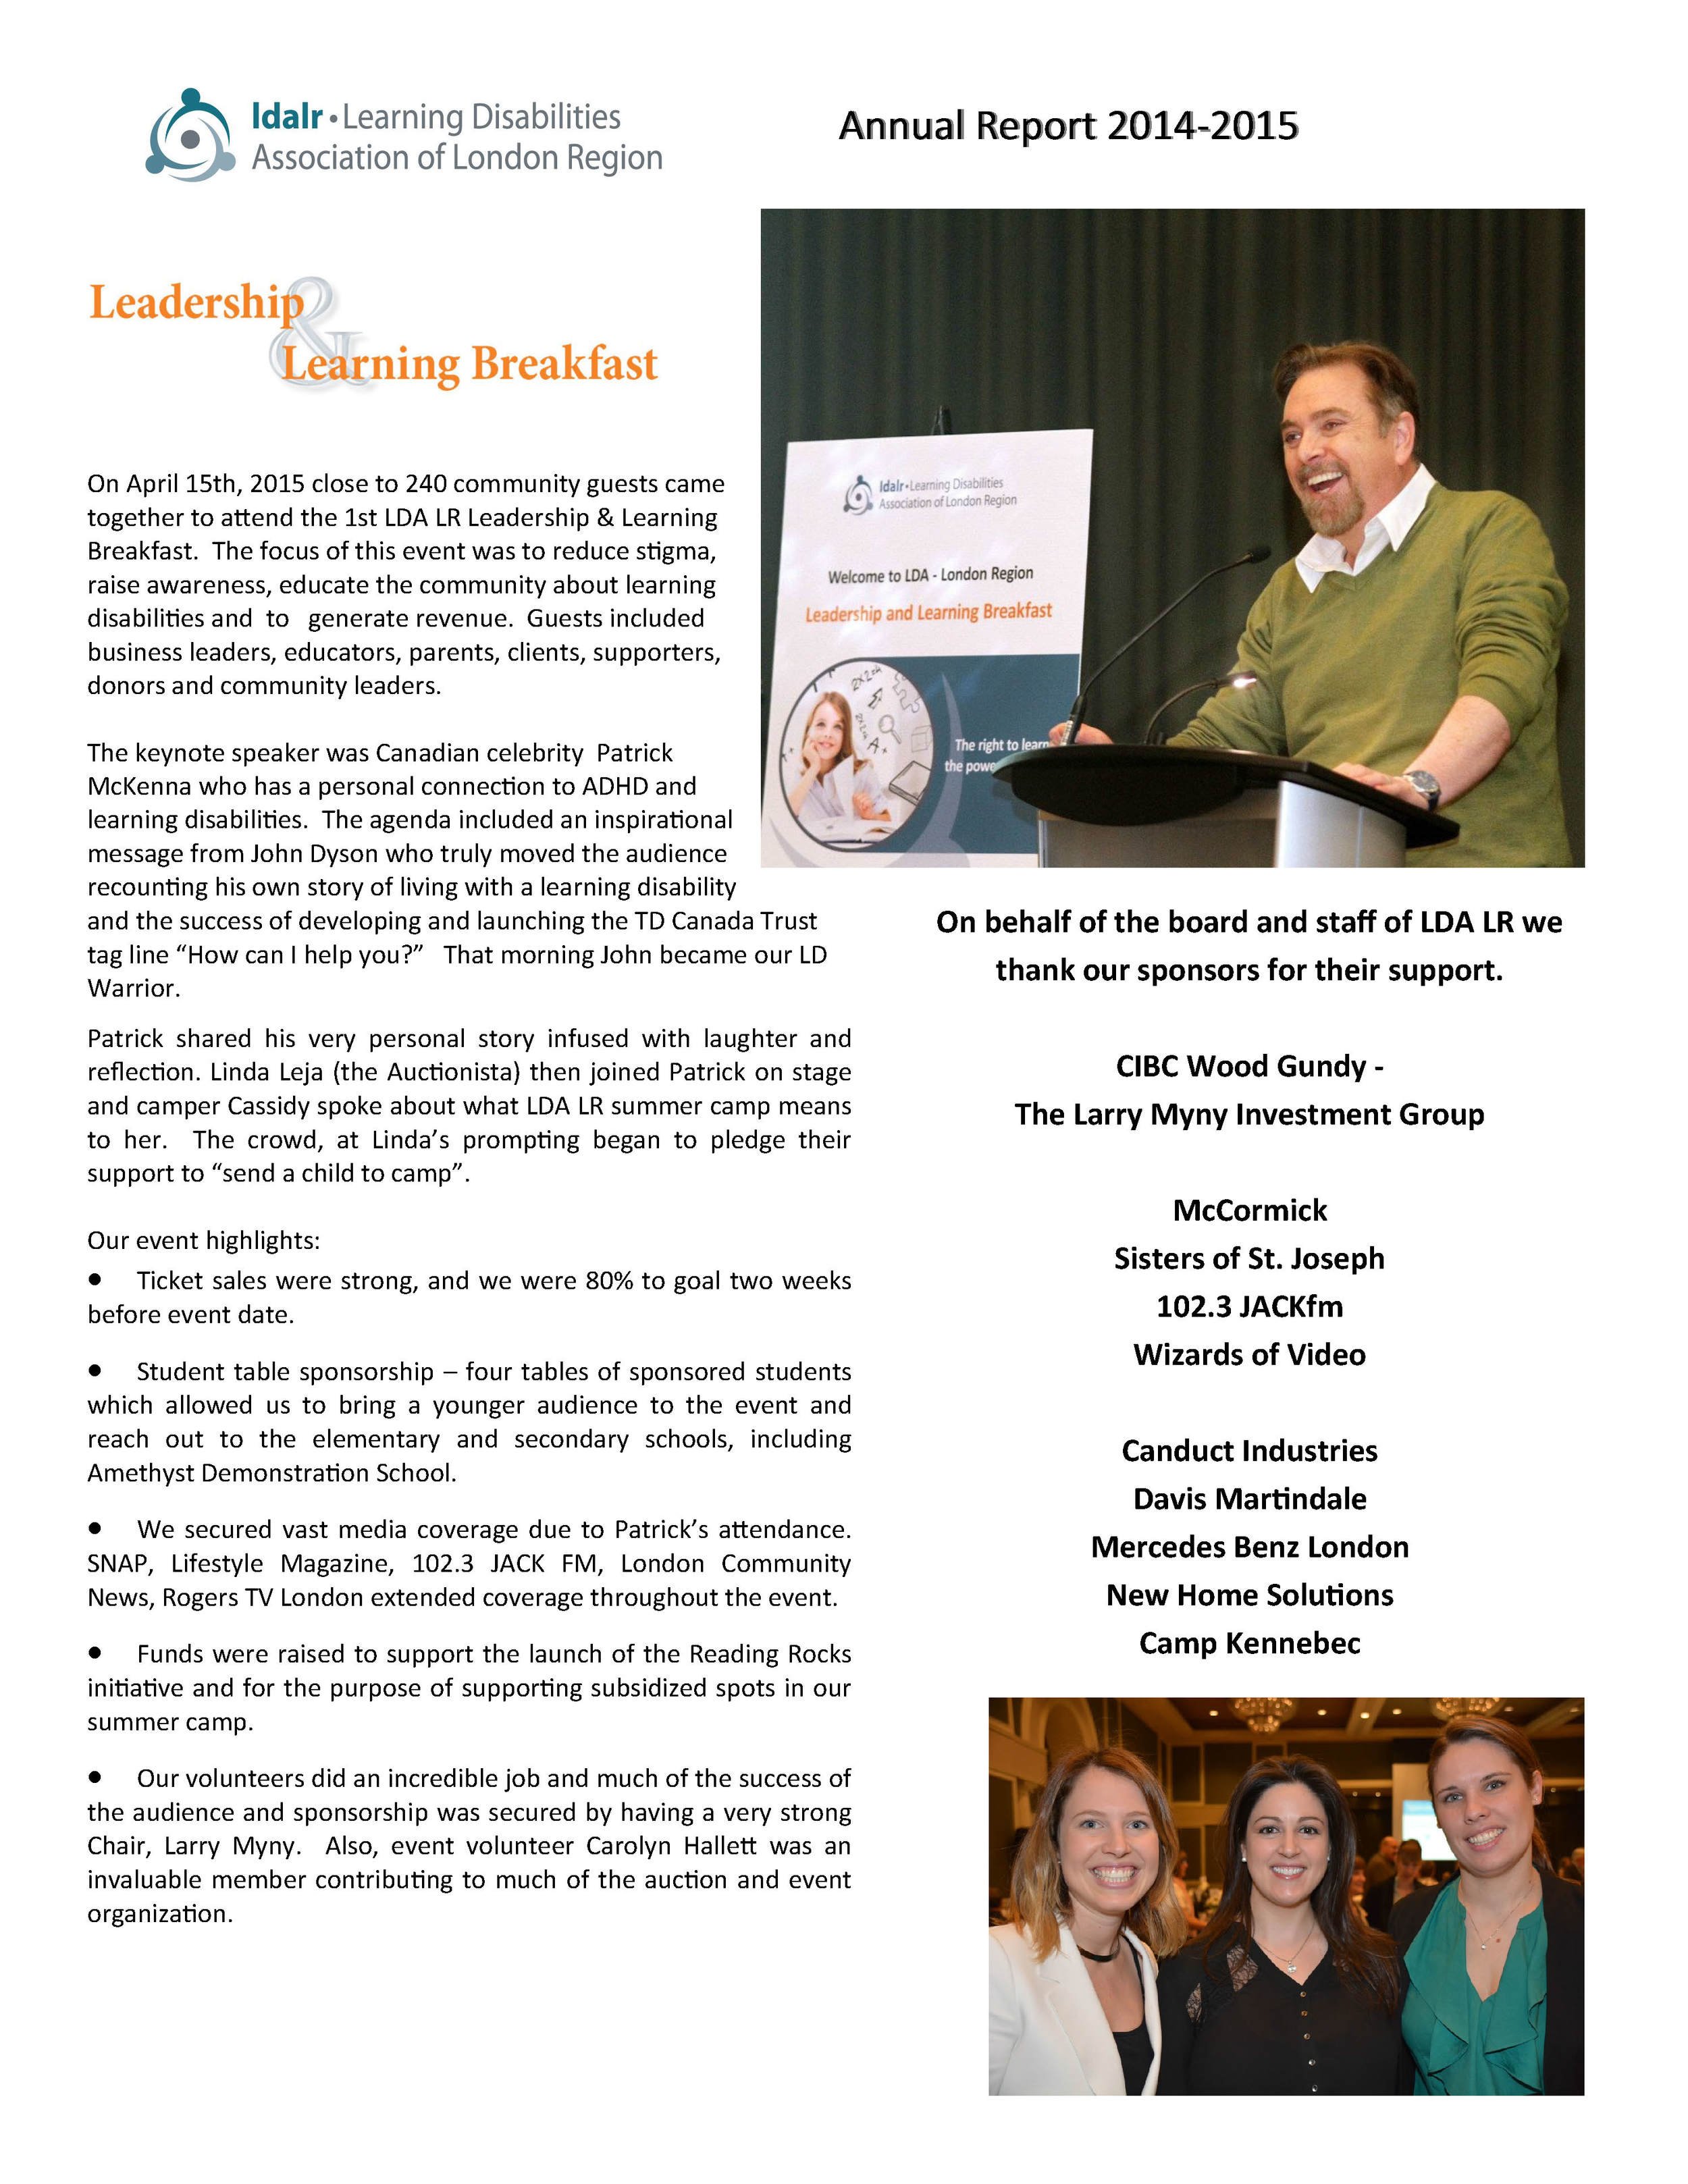 LDA LR Annual Report 2014-2015_PRINT_Page_5.jpg